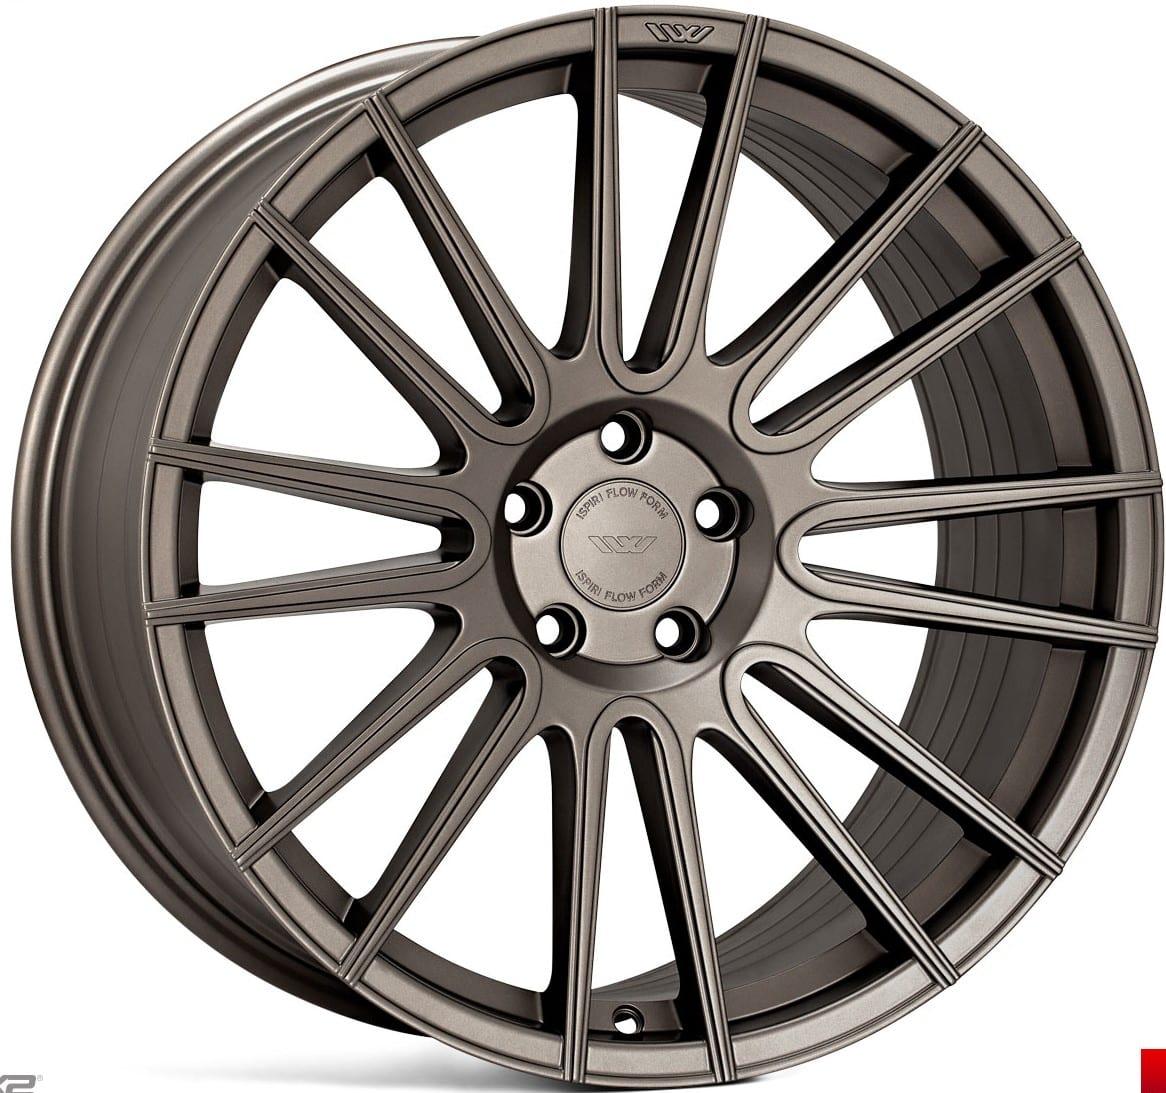 Ispiri - FFR8 (Matt Carbon Bronze)